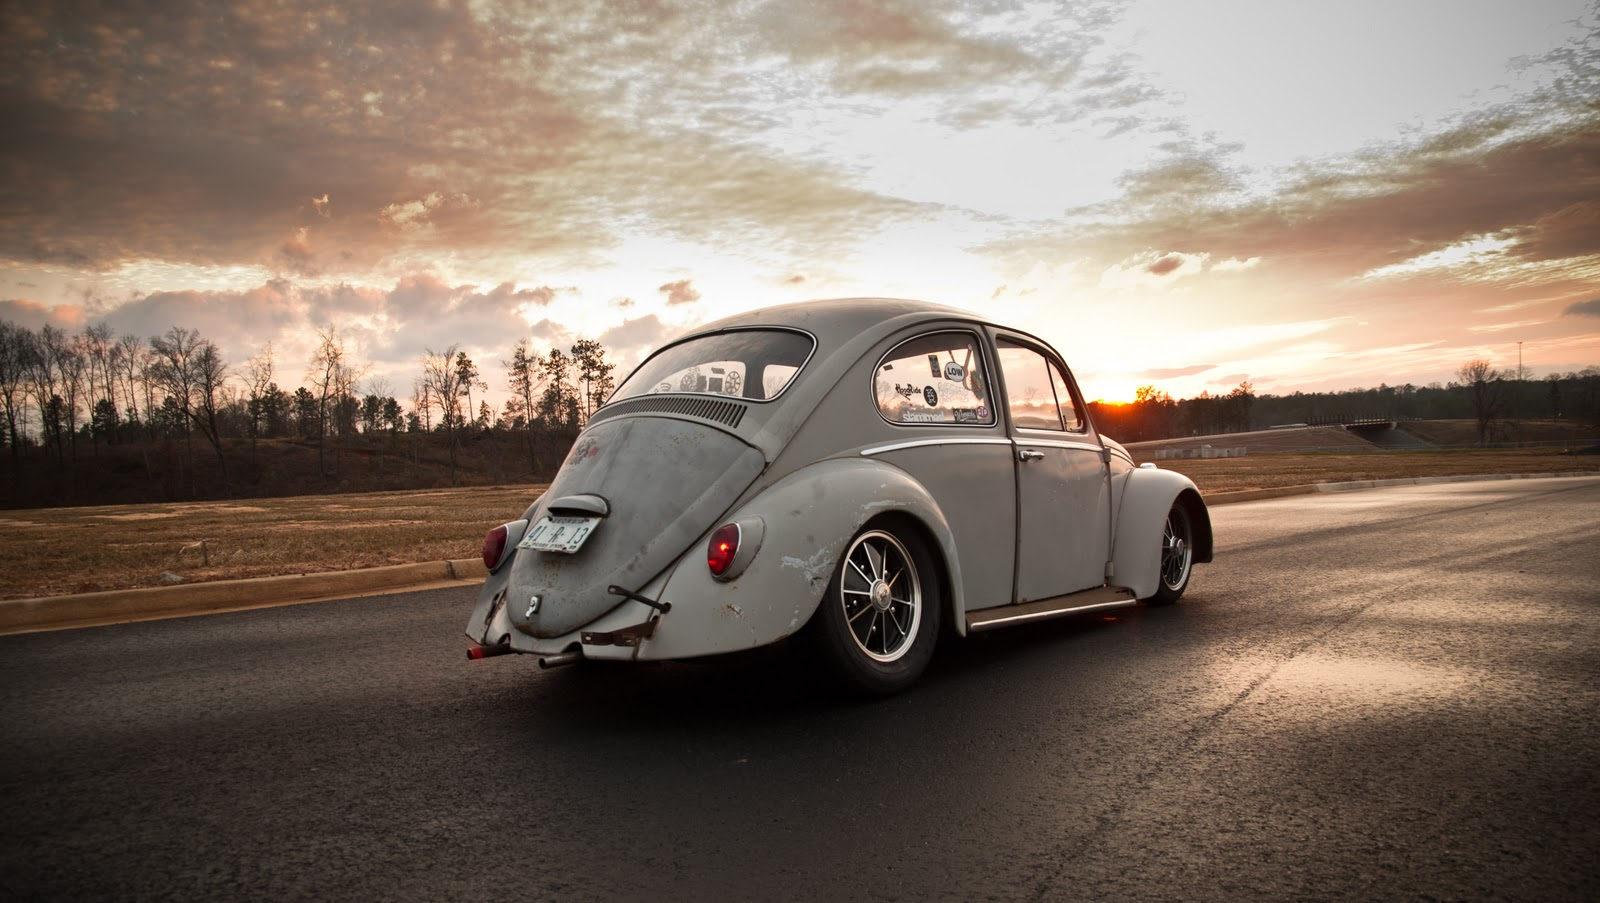 Otis - my '65 Beetle DSC_0021